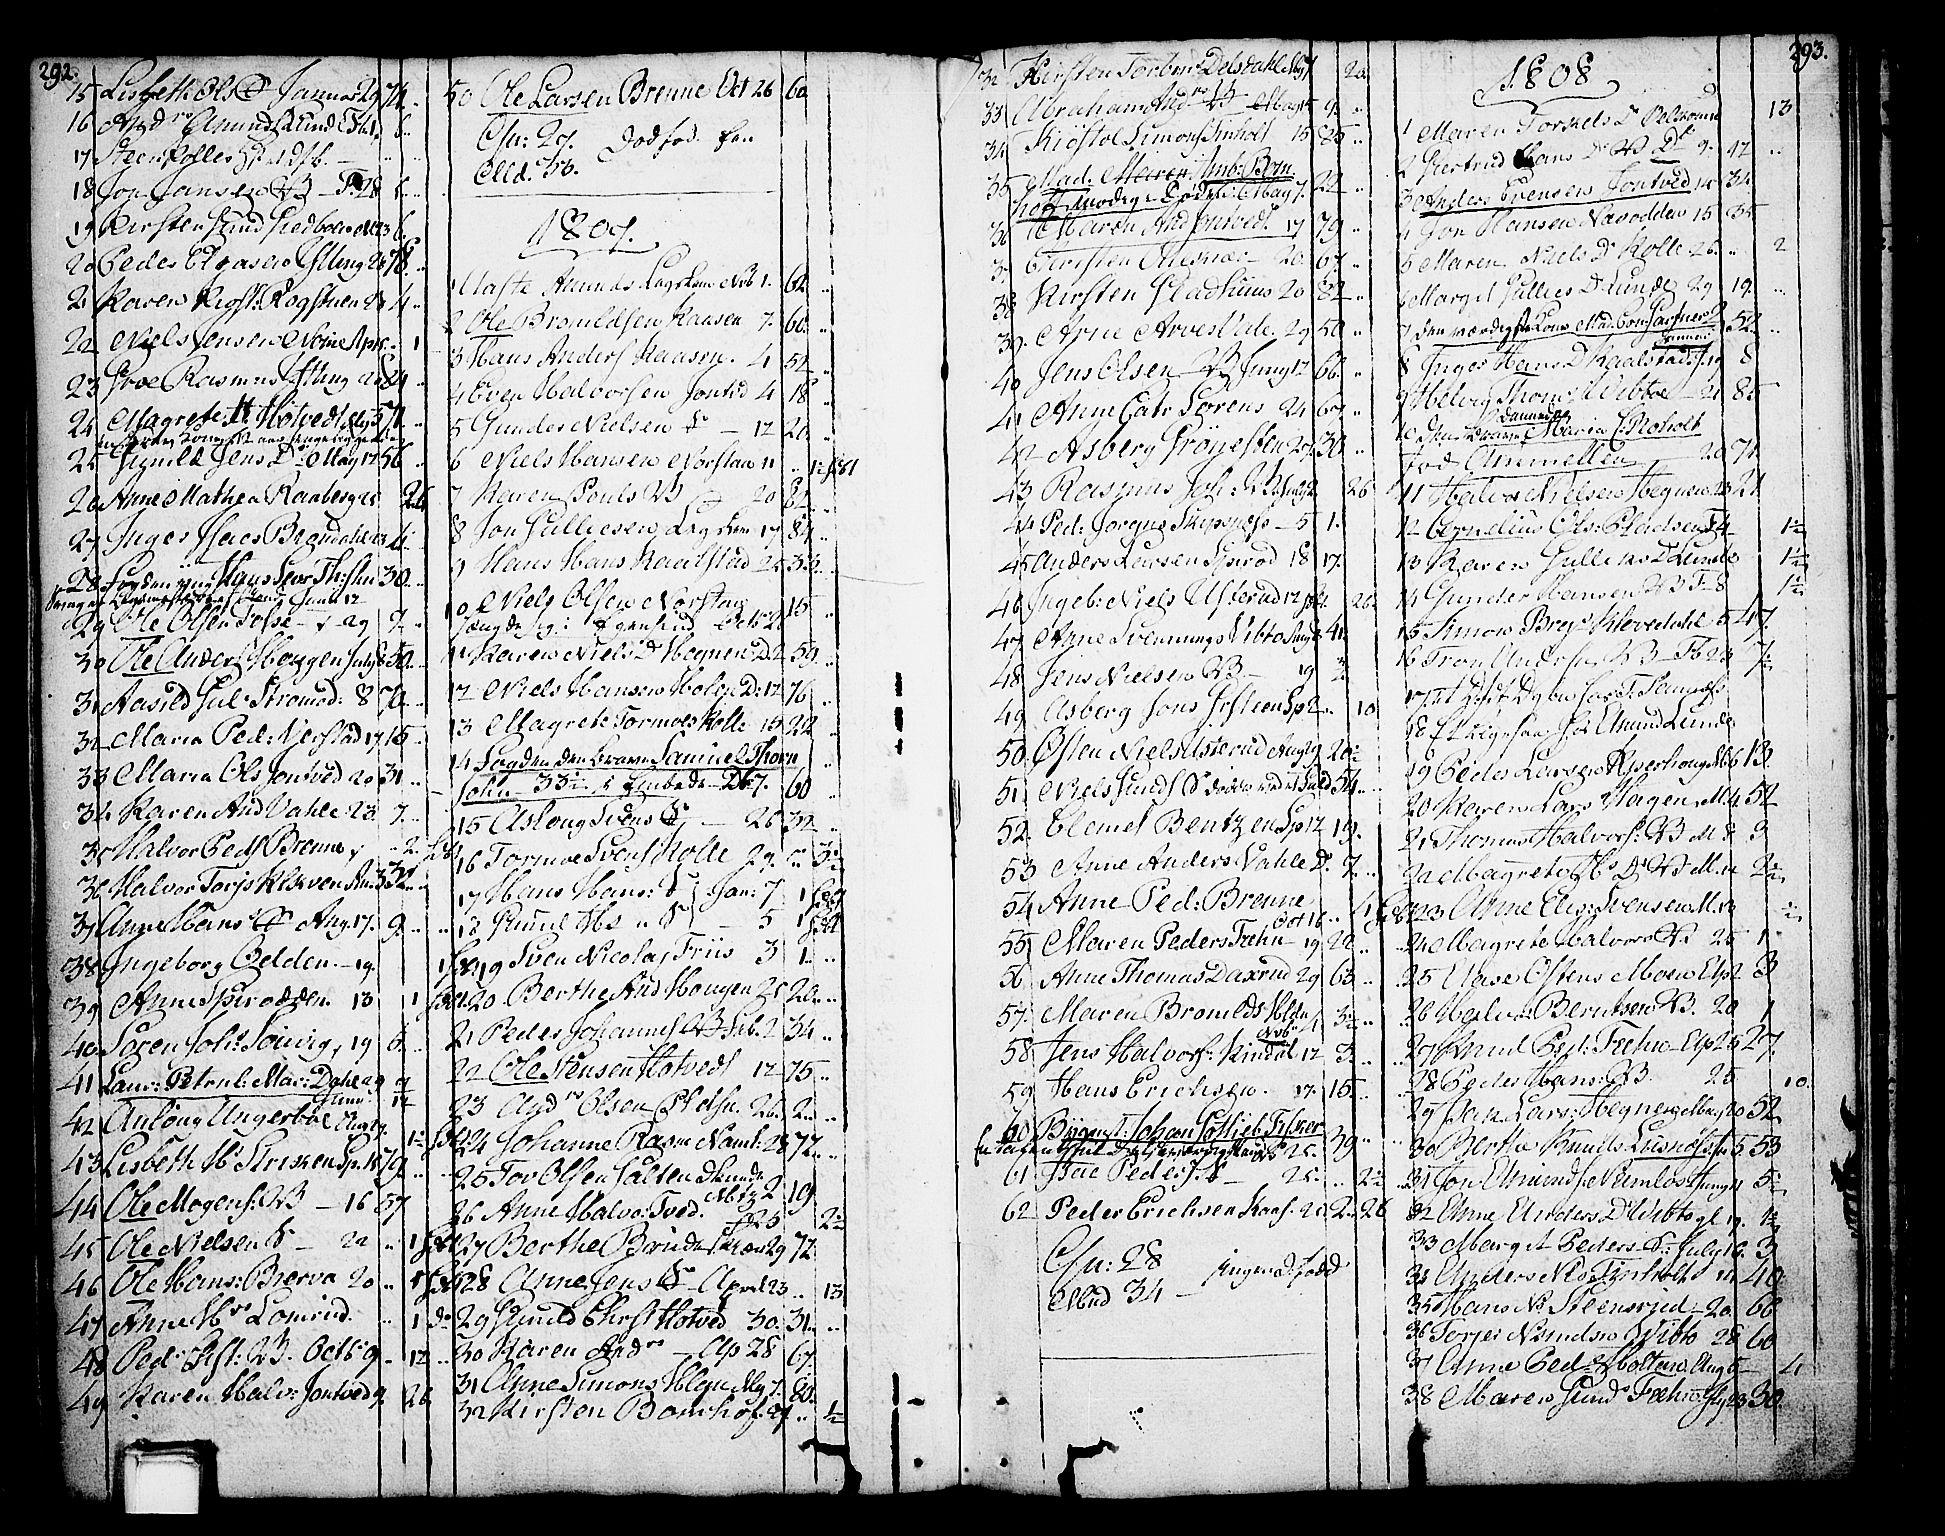 SAKO, Holla kirkebøker, F/Fa/L0002: Ministerialbok nr. 2, 1779-1814, s. 292-293